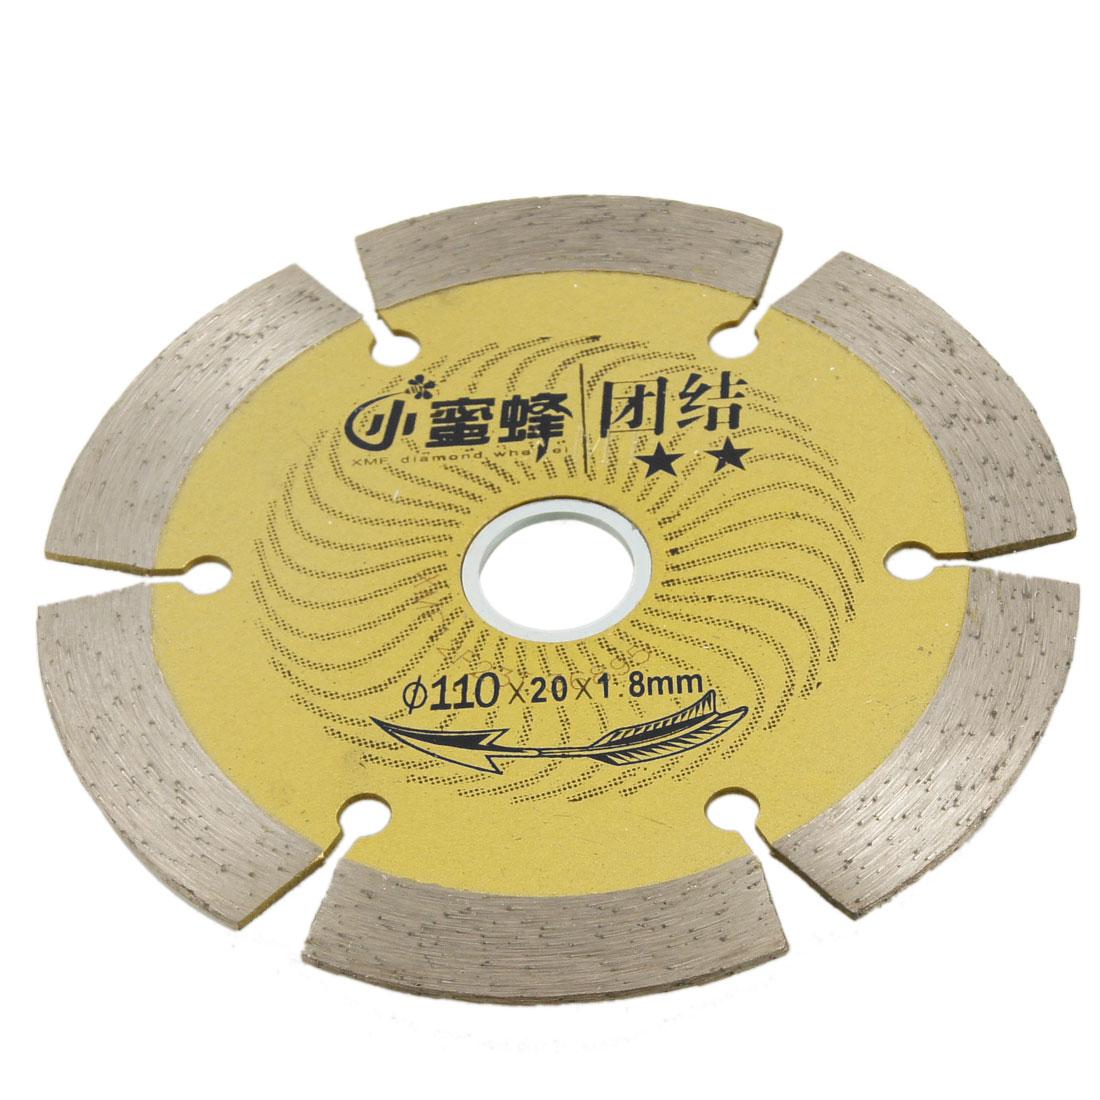 110mm x 16mm x 1.8mm Diamond Circular Crack Chaser Saw Cutter